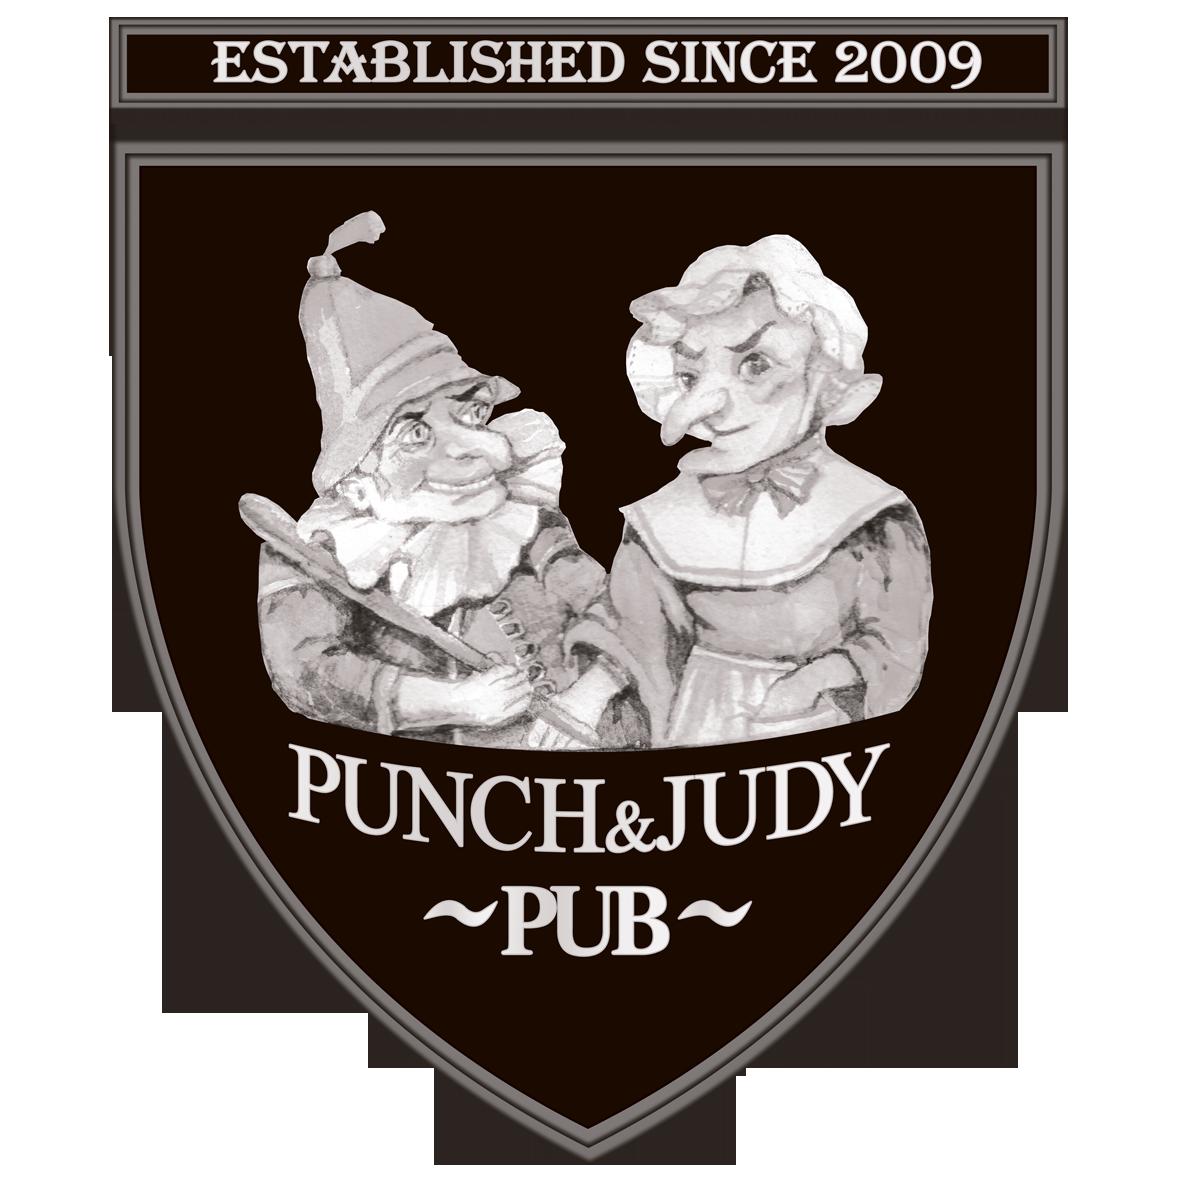 PunchJudy-logo